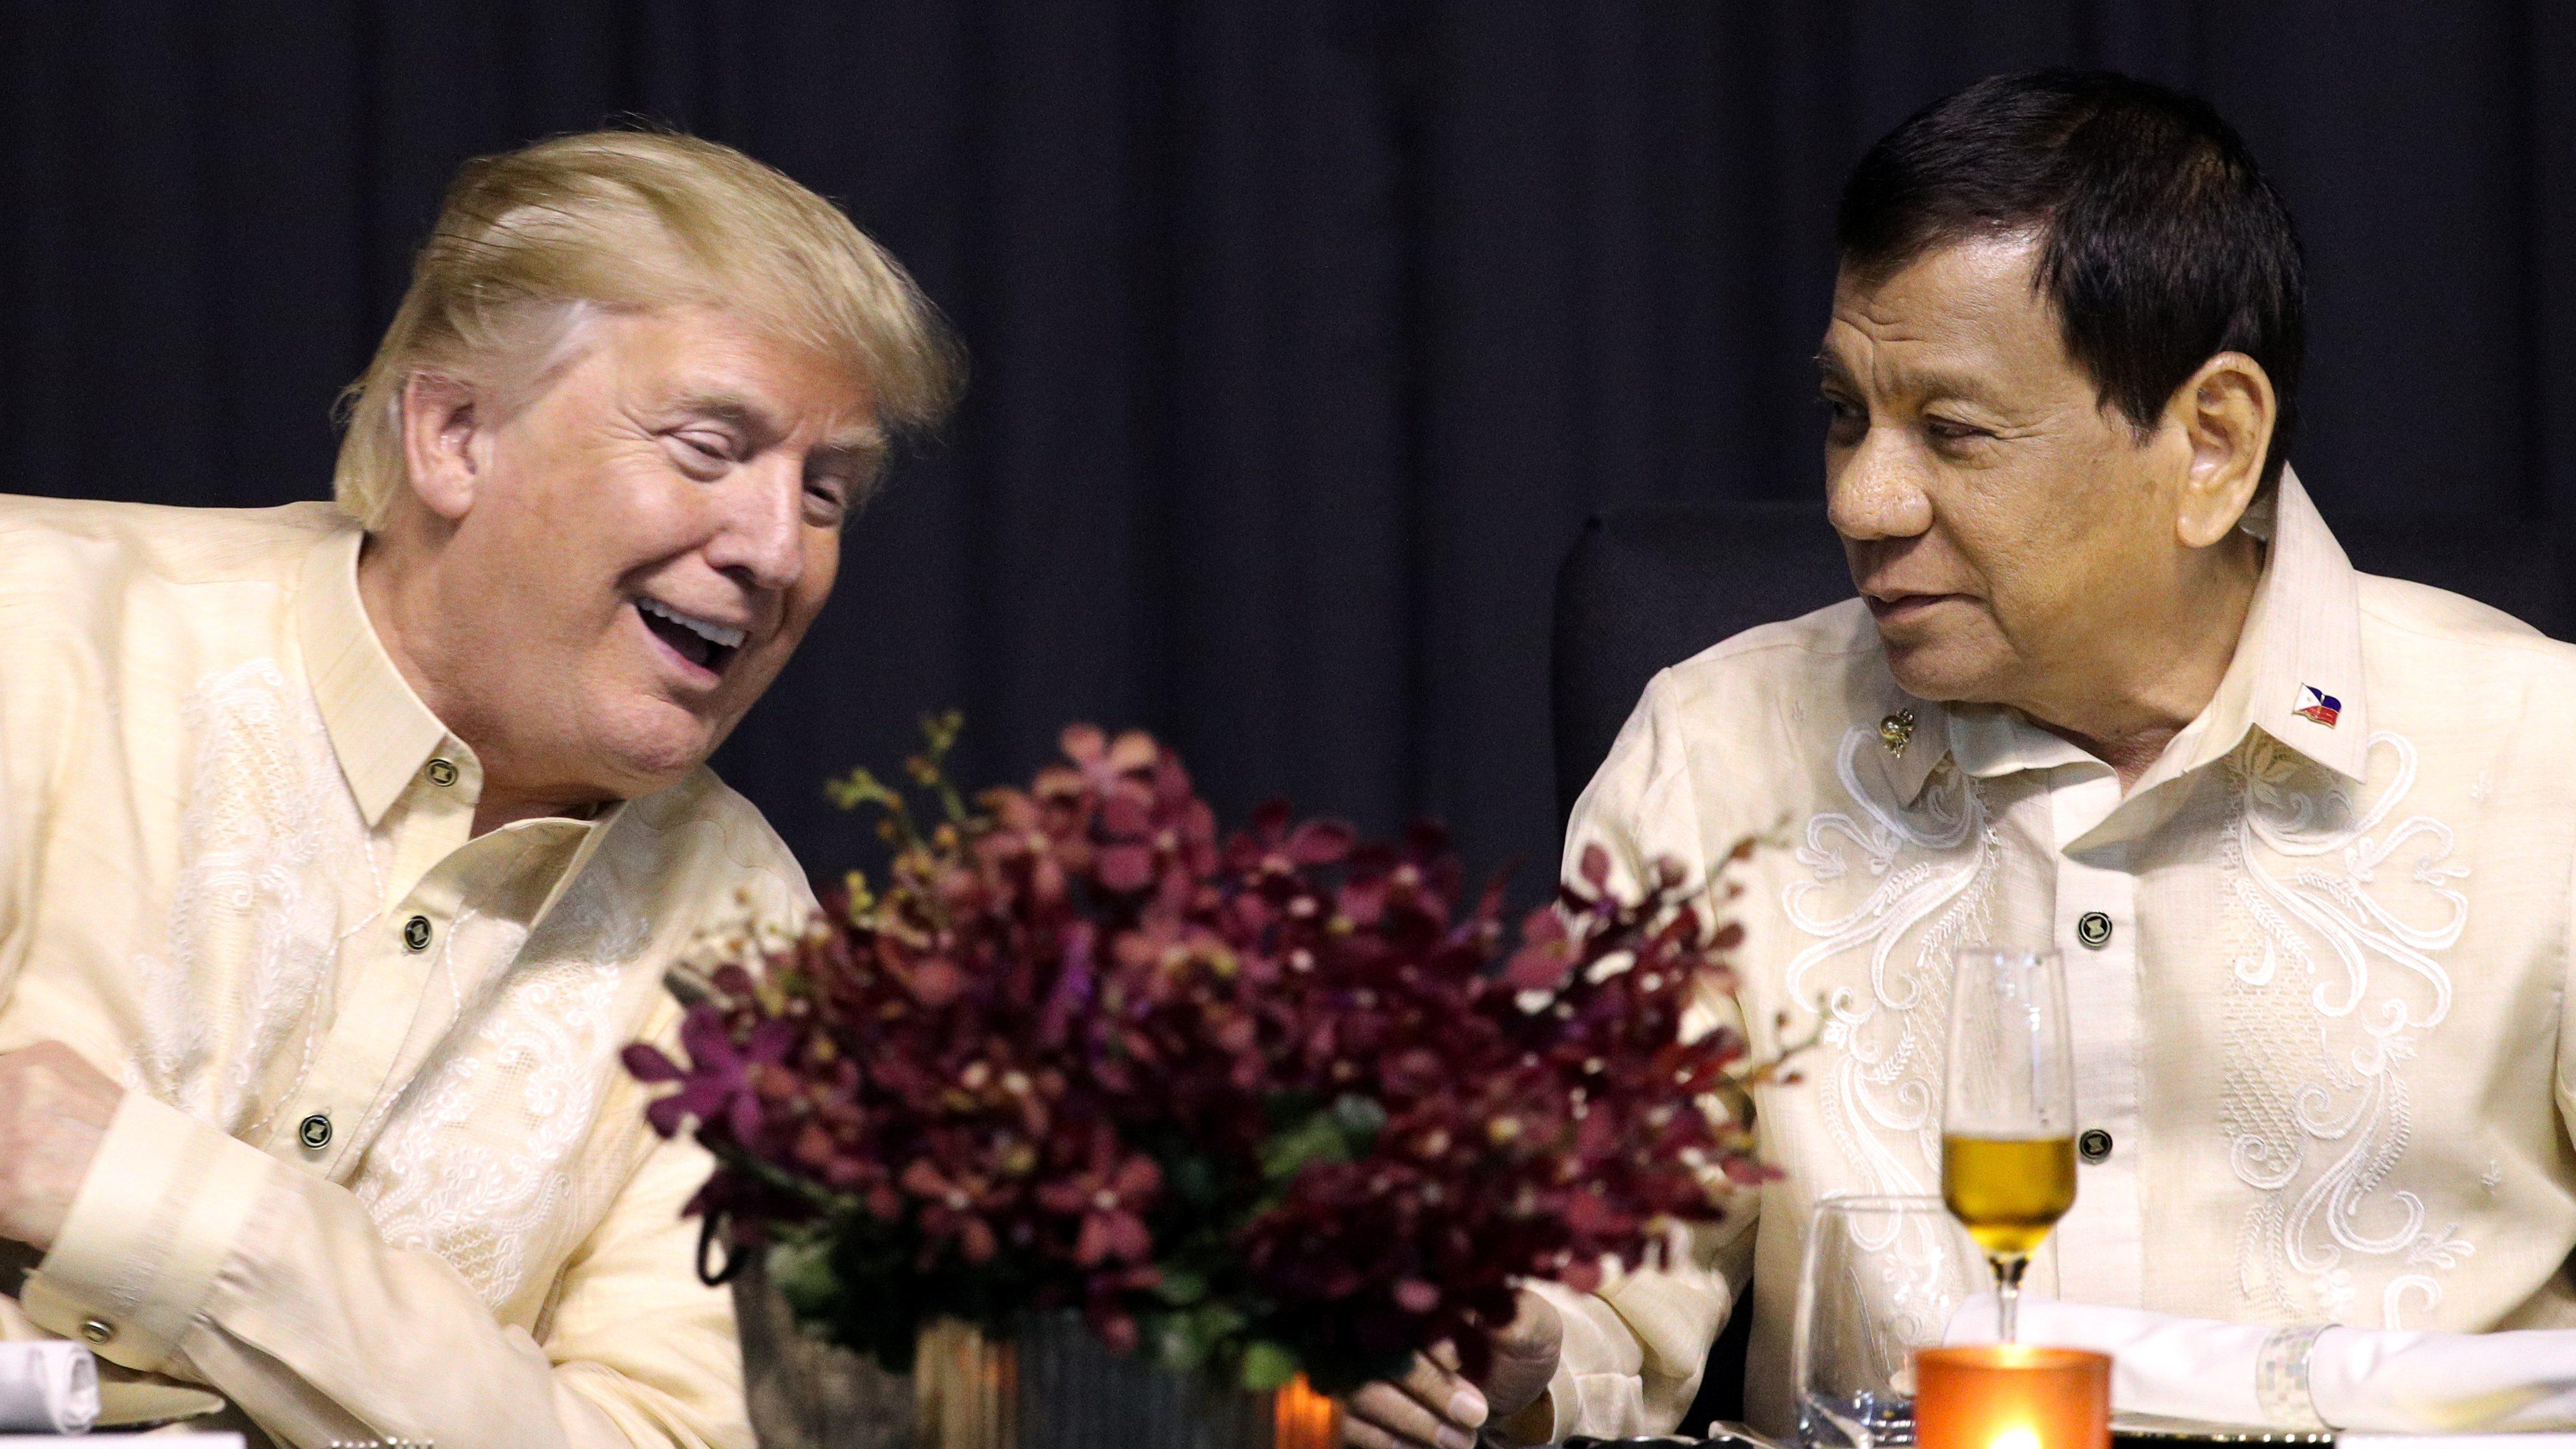 U.S. President Donald Trump speaks with Philippines President Rodrigo Duterte during the gala dinner marking ASEAN's 50th anniversary in Manila, Philippines, November 12, 2017.